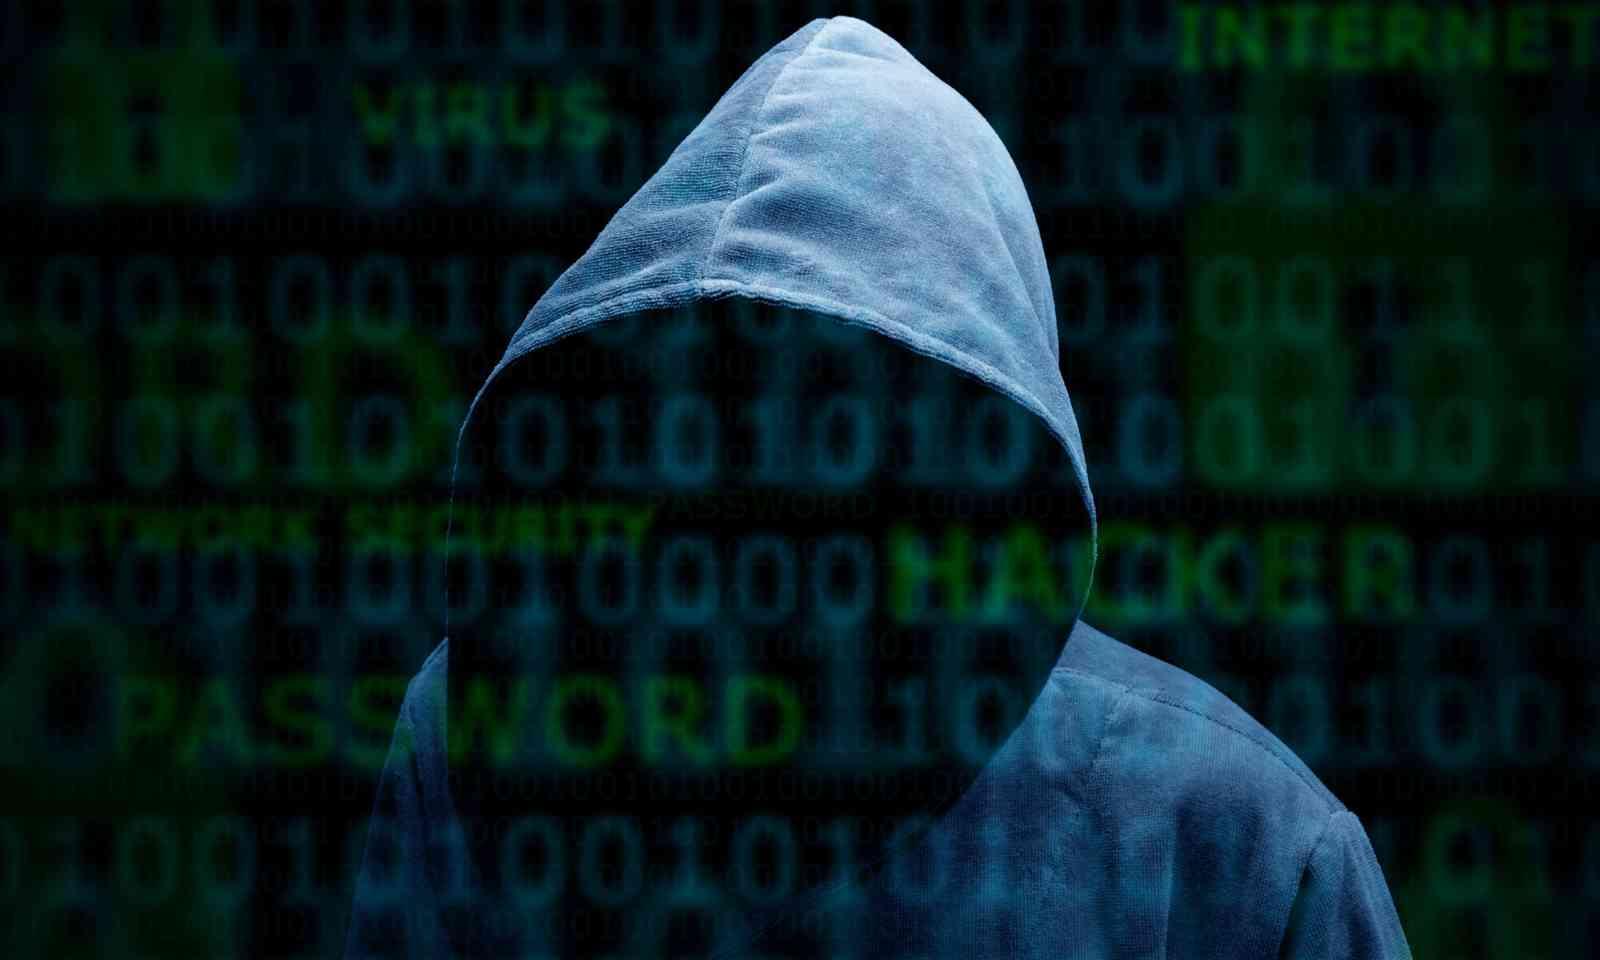 Hooded hacker (Dreamstime)